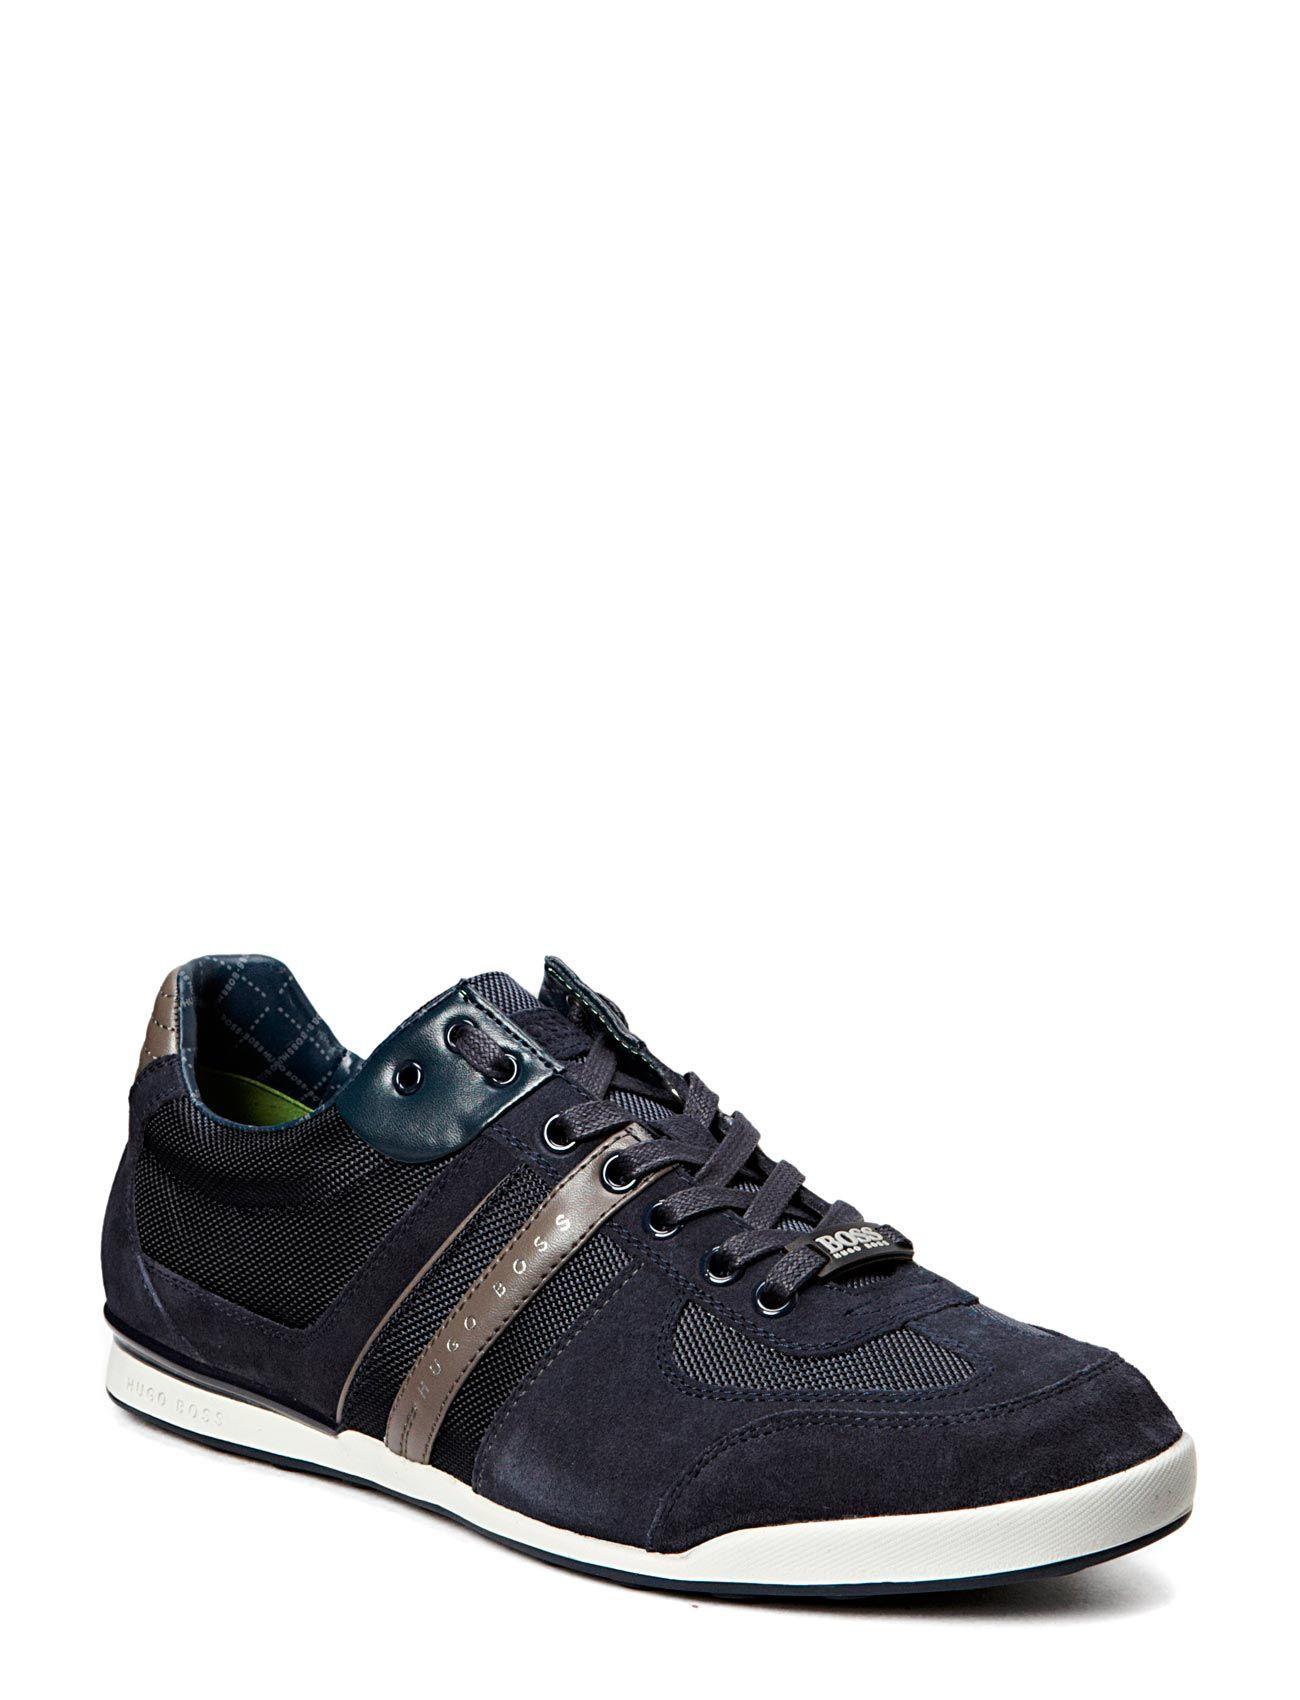 Akeen BOSS GREEN Sneakers til Mænd i Mørkeblå